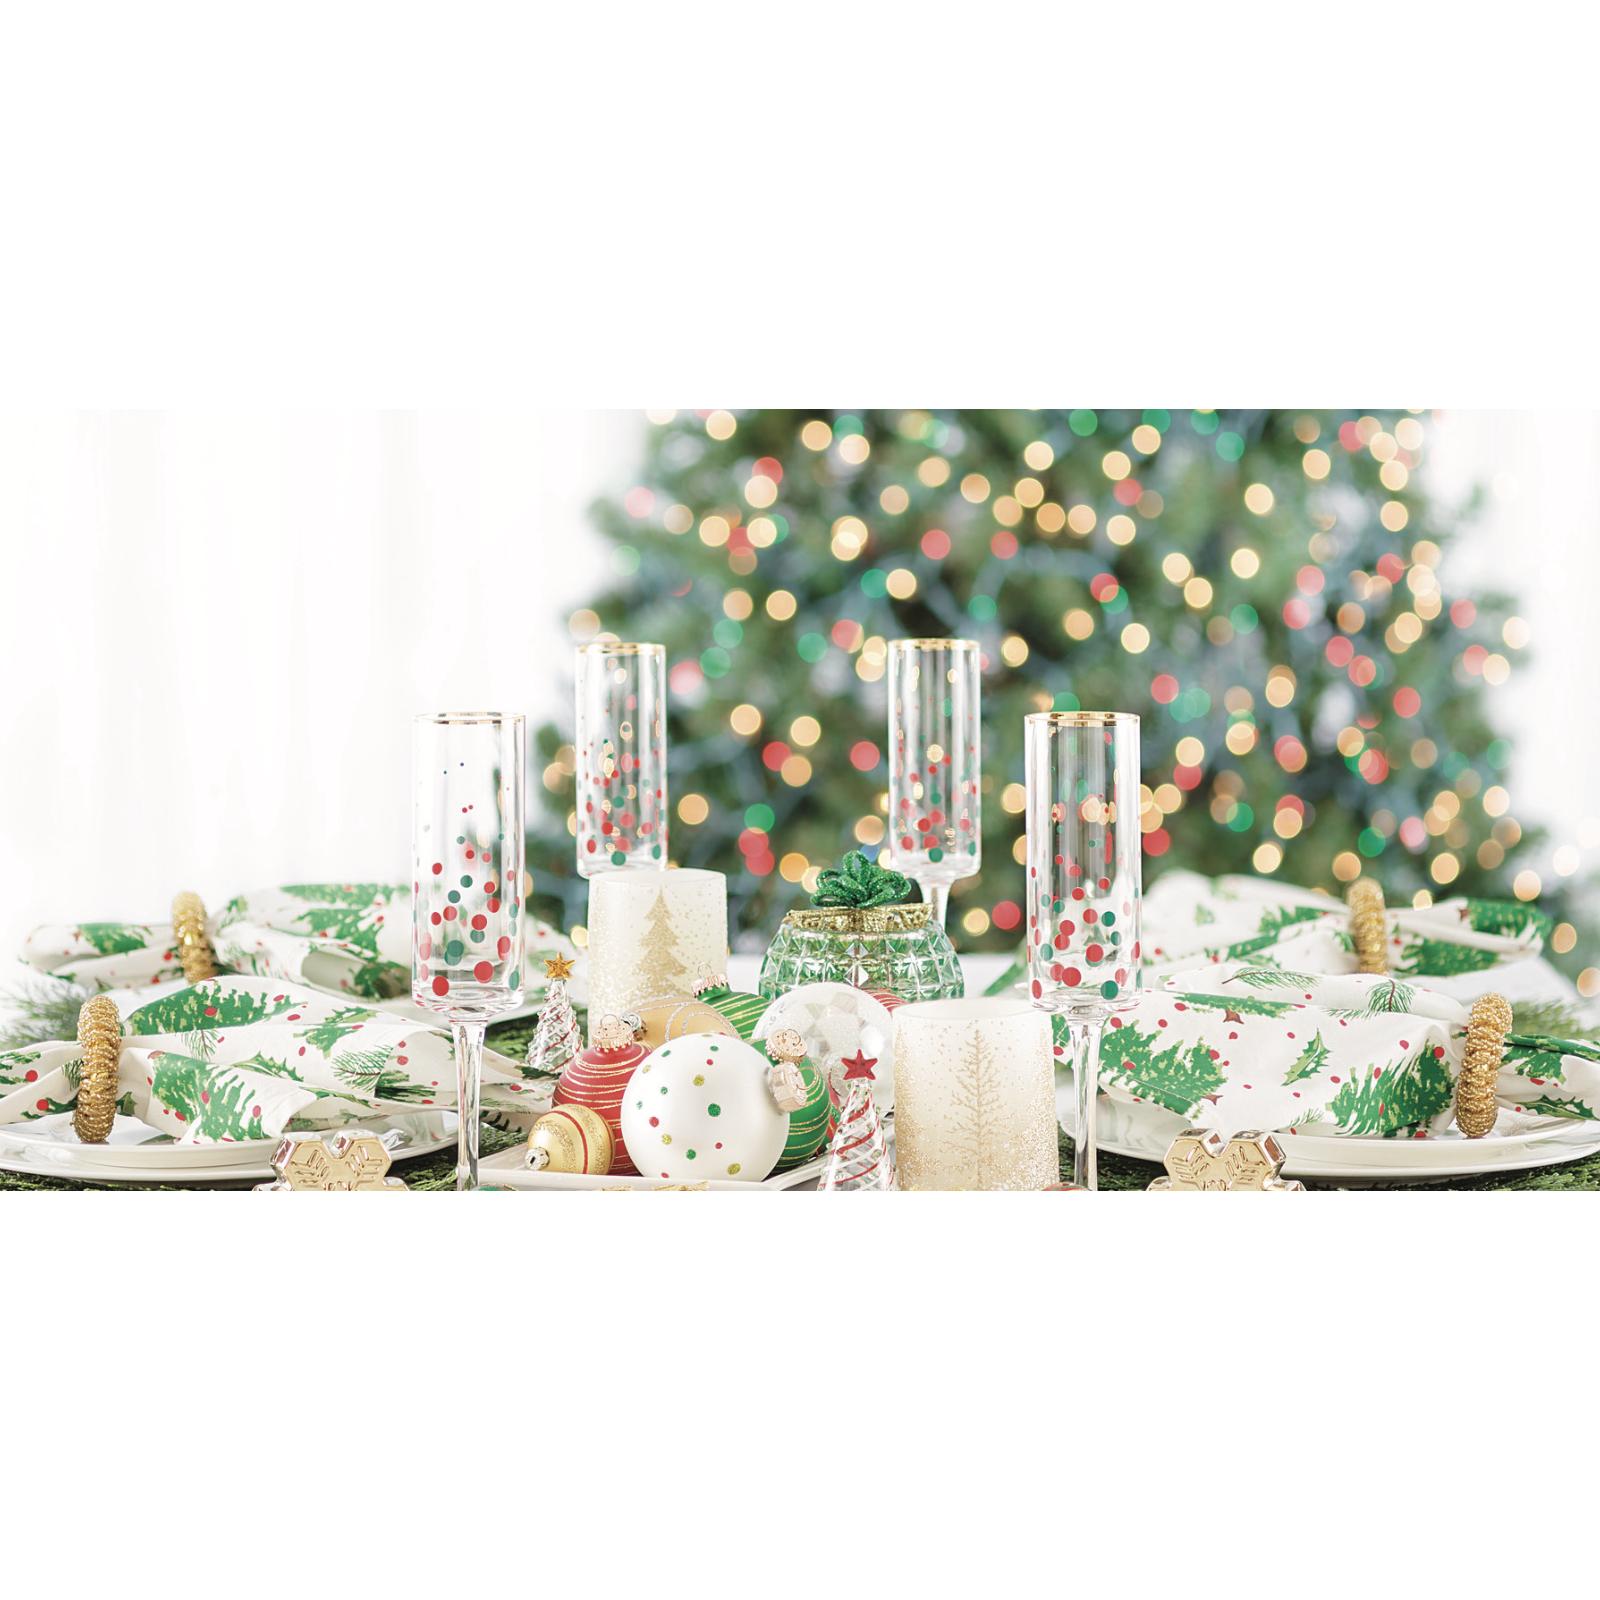 5 ways to make a worry free holiday celebration